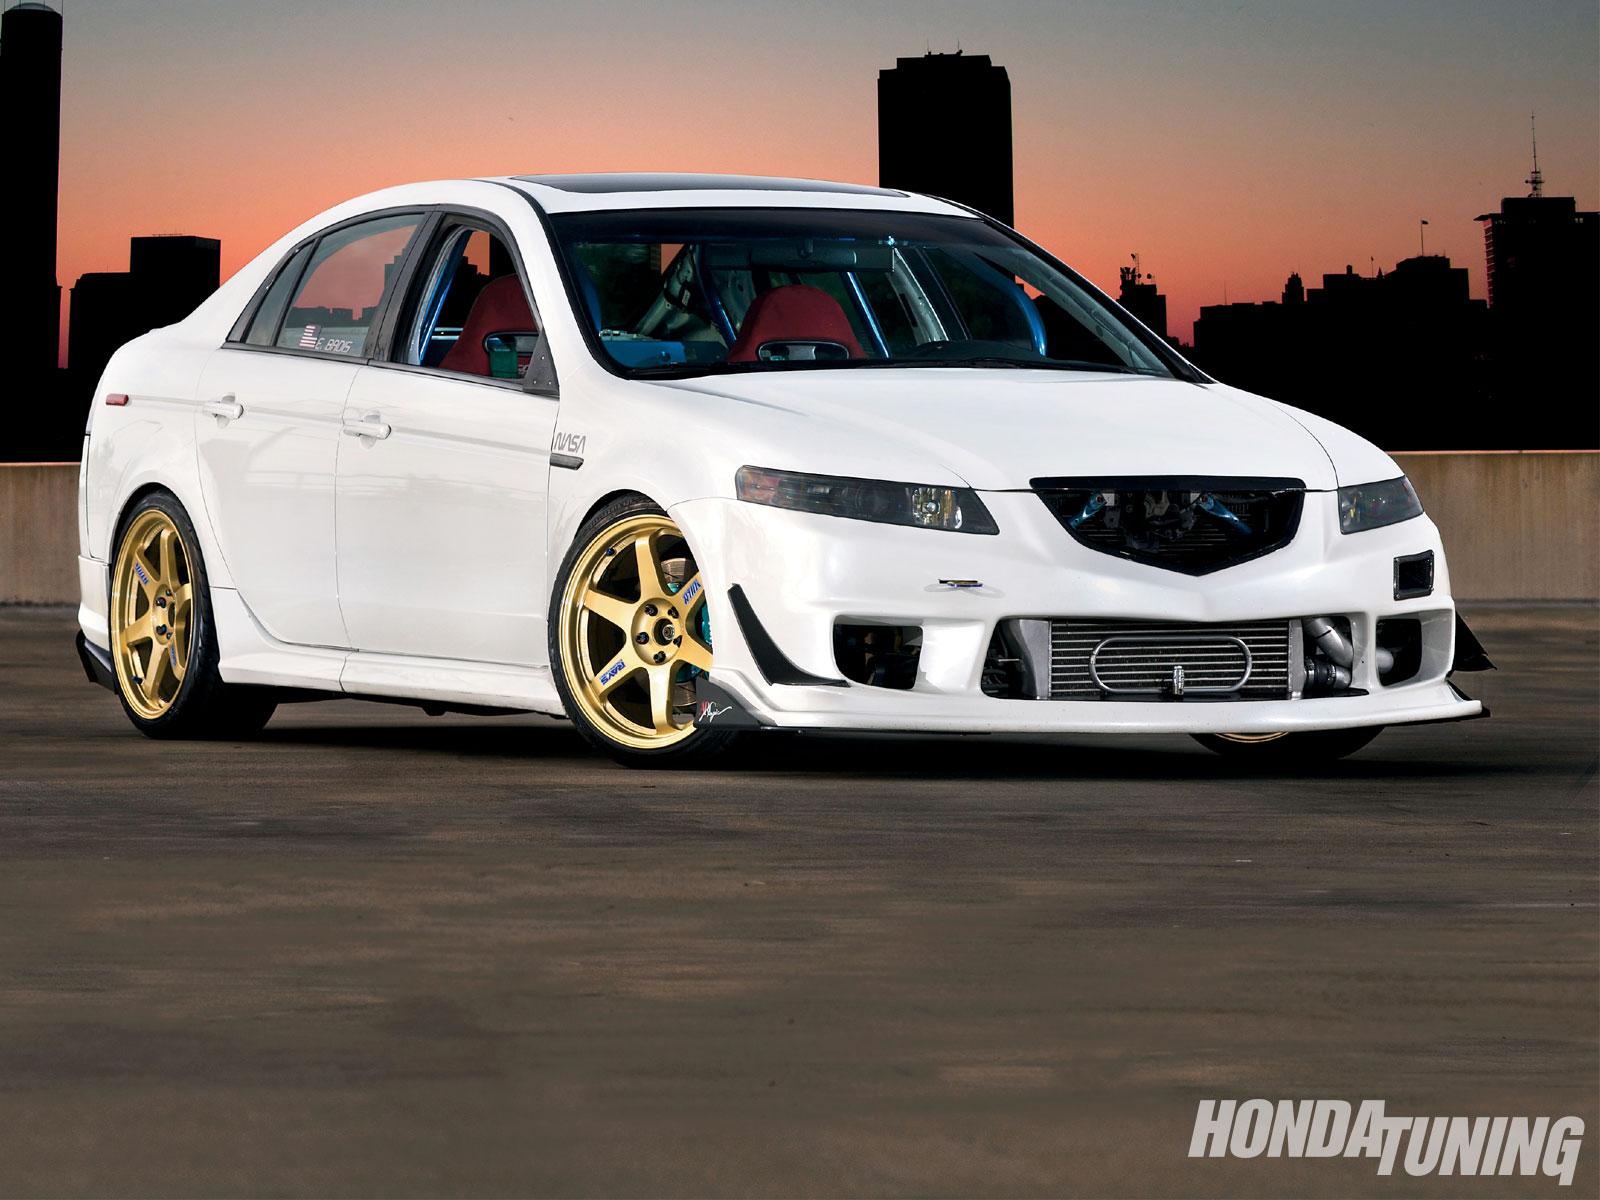 2005 Acura TL - Daring To Be Different - Honda Tuning Magazine